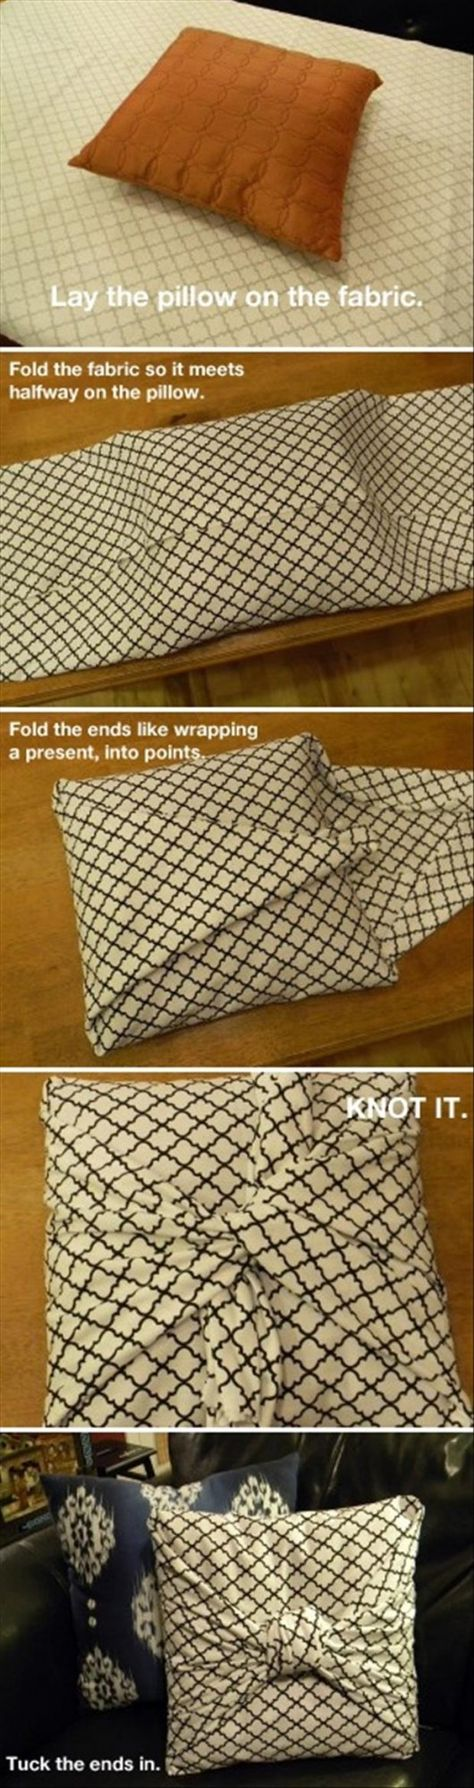 DIY Tutorials for Home Decoration - Pillow cover